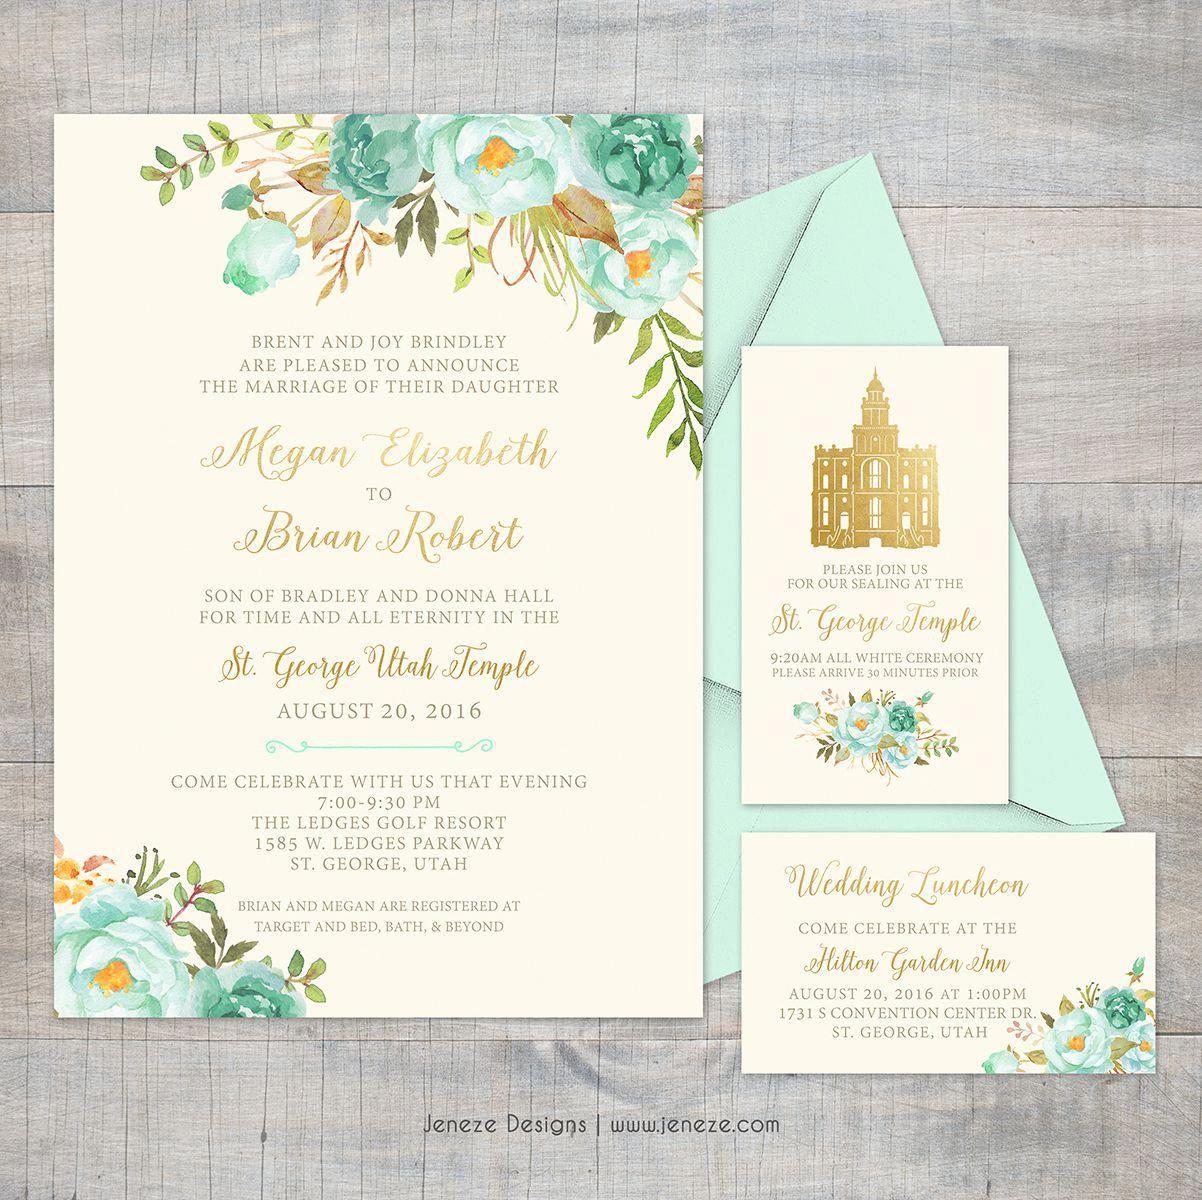 Pretty Mint Floral Boho Wedding Invitations Pretty Mint Green Flowers Wedding Invitations Boho Boho Floral Wedding Invitations Lds Temple Wedding Invitations